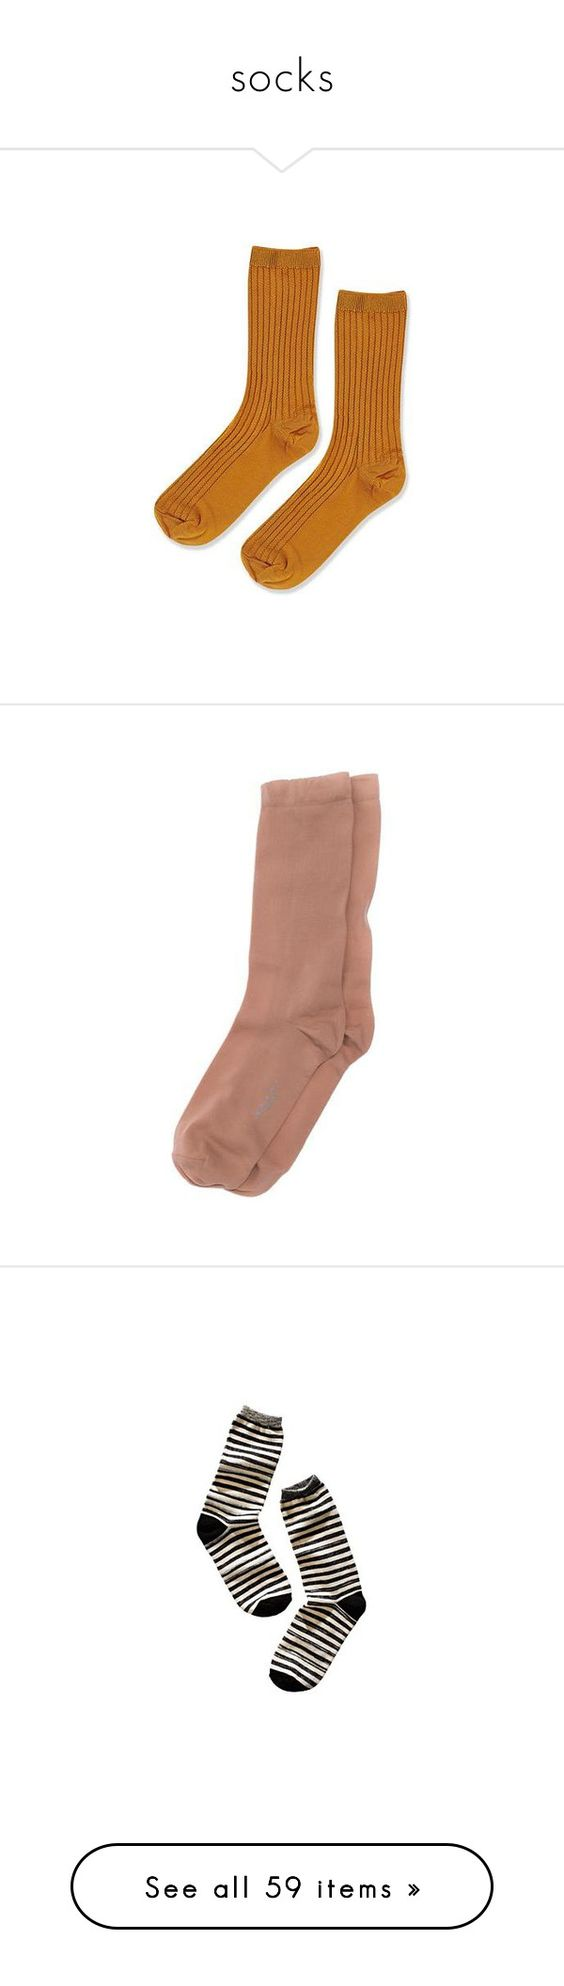 """socks"" by httpmorgann ❤ liked on Polyvore featuring intimates, hosiery, socks, mustard, short socks, topshop socks, topshop, ankle socks, tennis socks and accessories"